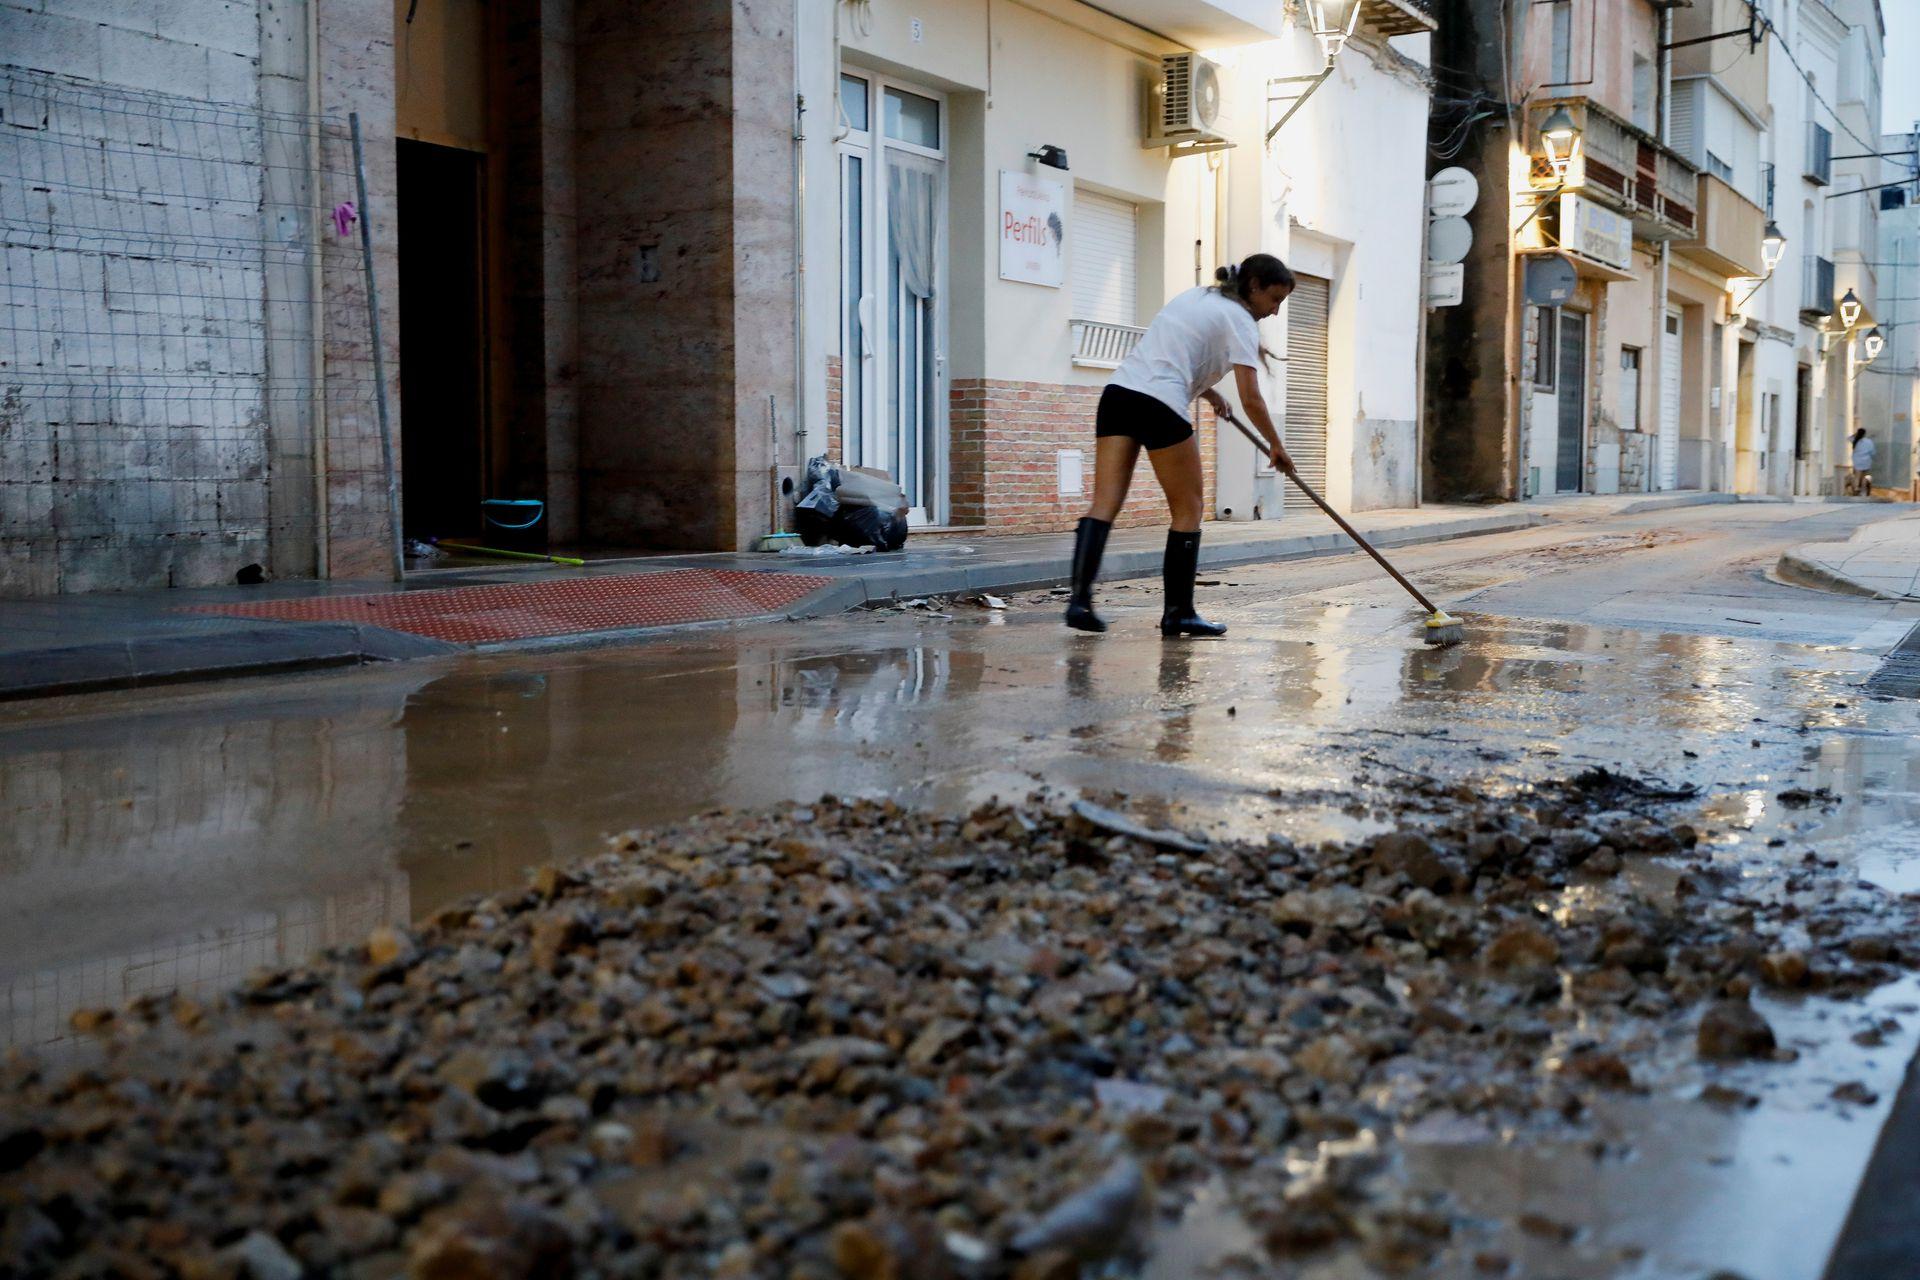 Сносит все. В Испании бушует ливневый шторм — фото и видео